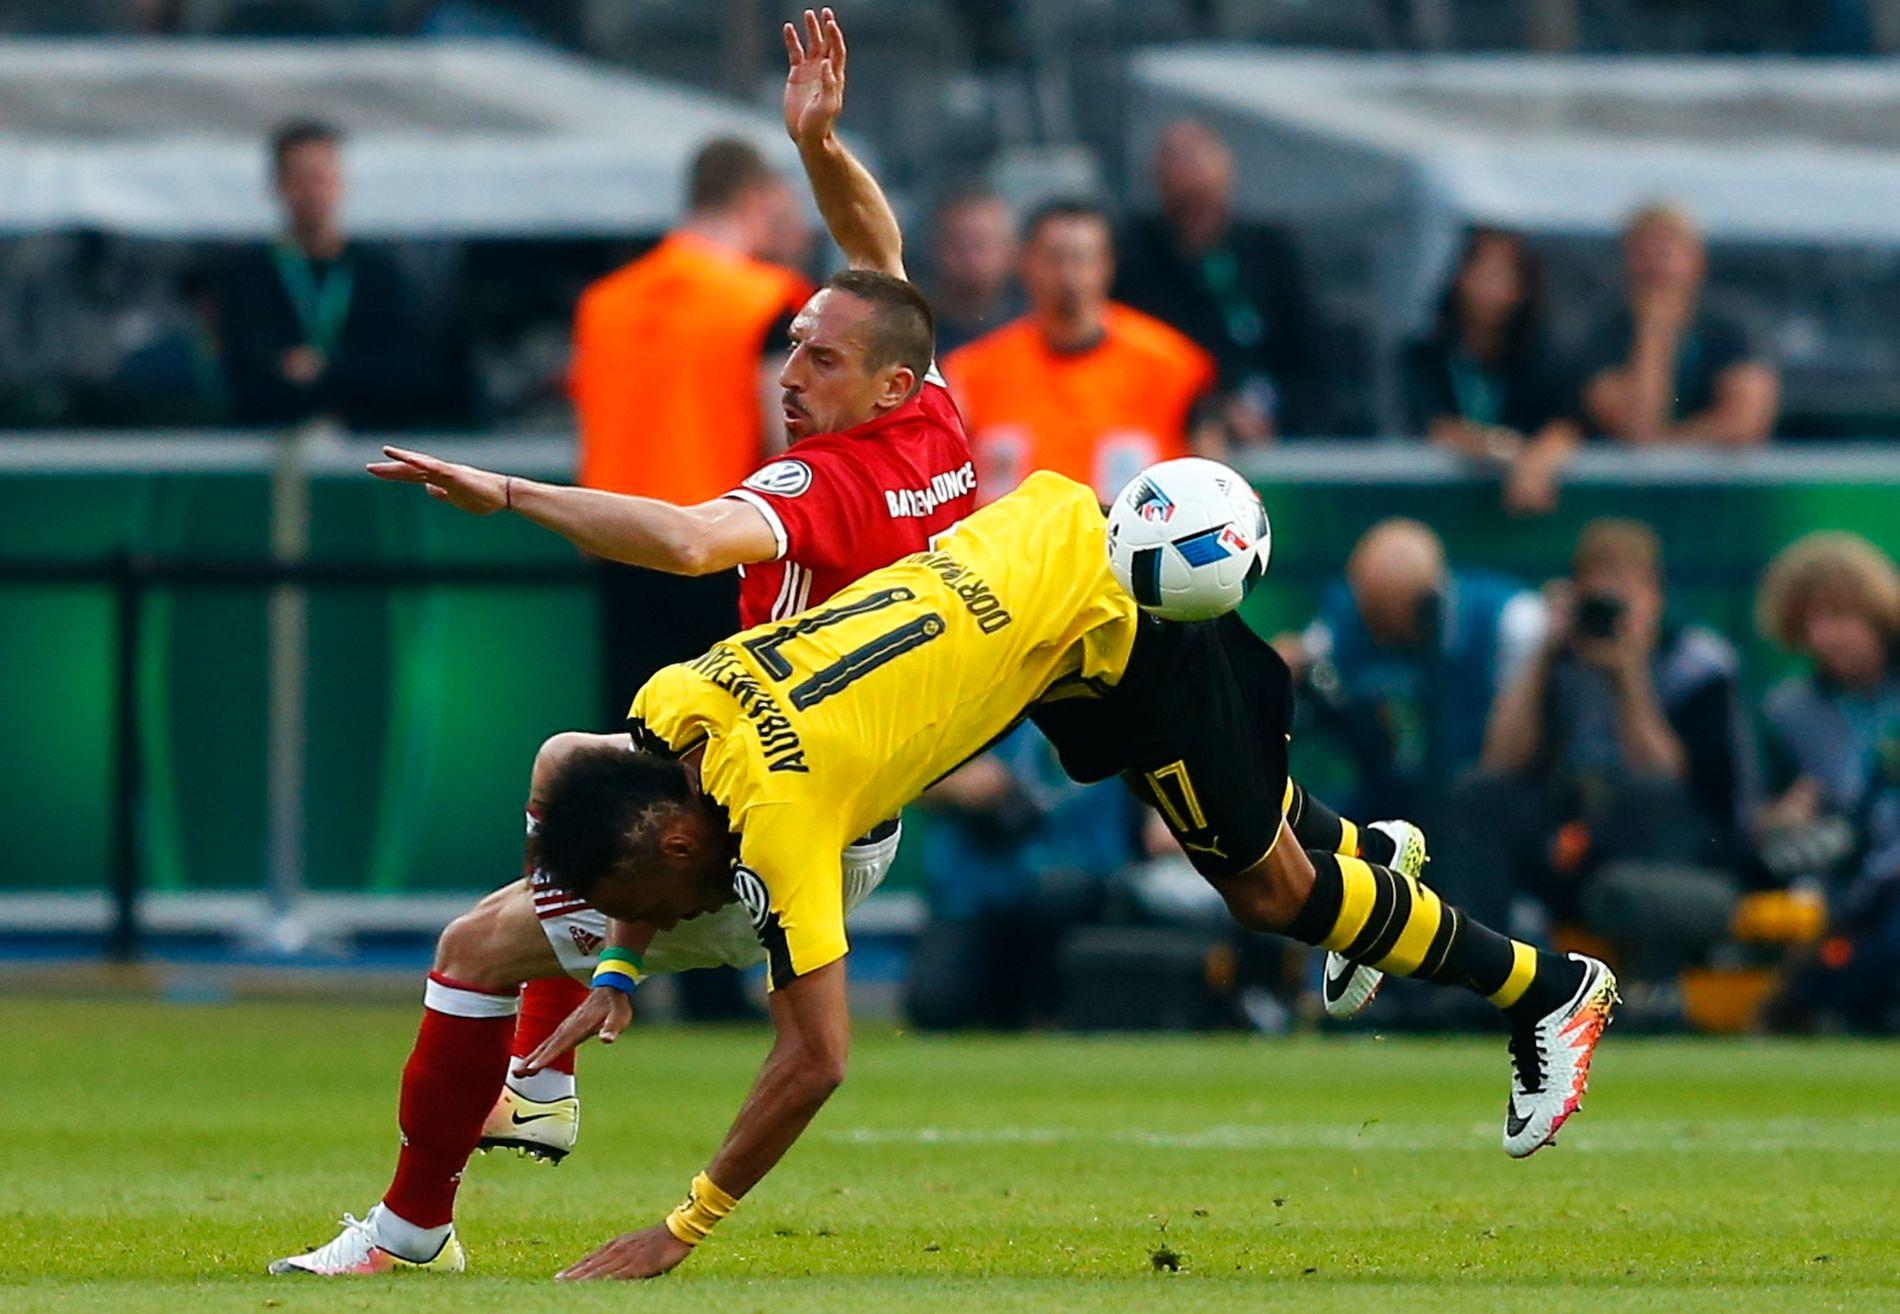 FINALEDUELL: Borussia Dortmunds Pierre-Emerick Aubameyang og Bayern Münchens Franck Ribery i en heftig duell på Olympiastadion i Berlin.